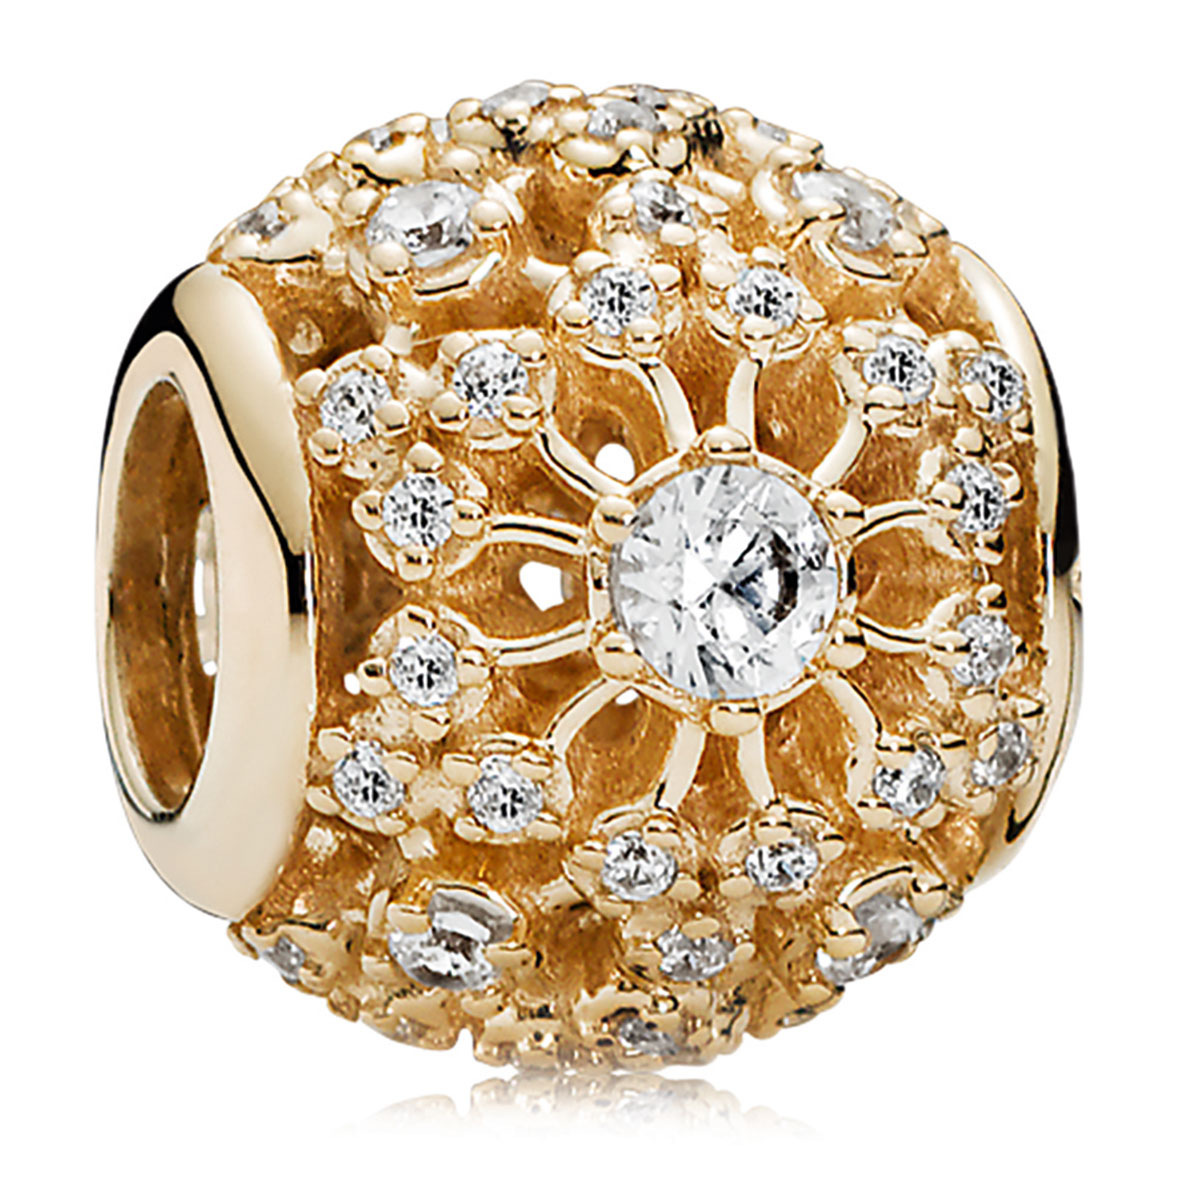 Pandora 14kt gold charms pancharmbracelets izmirmasajfo